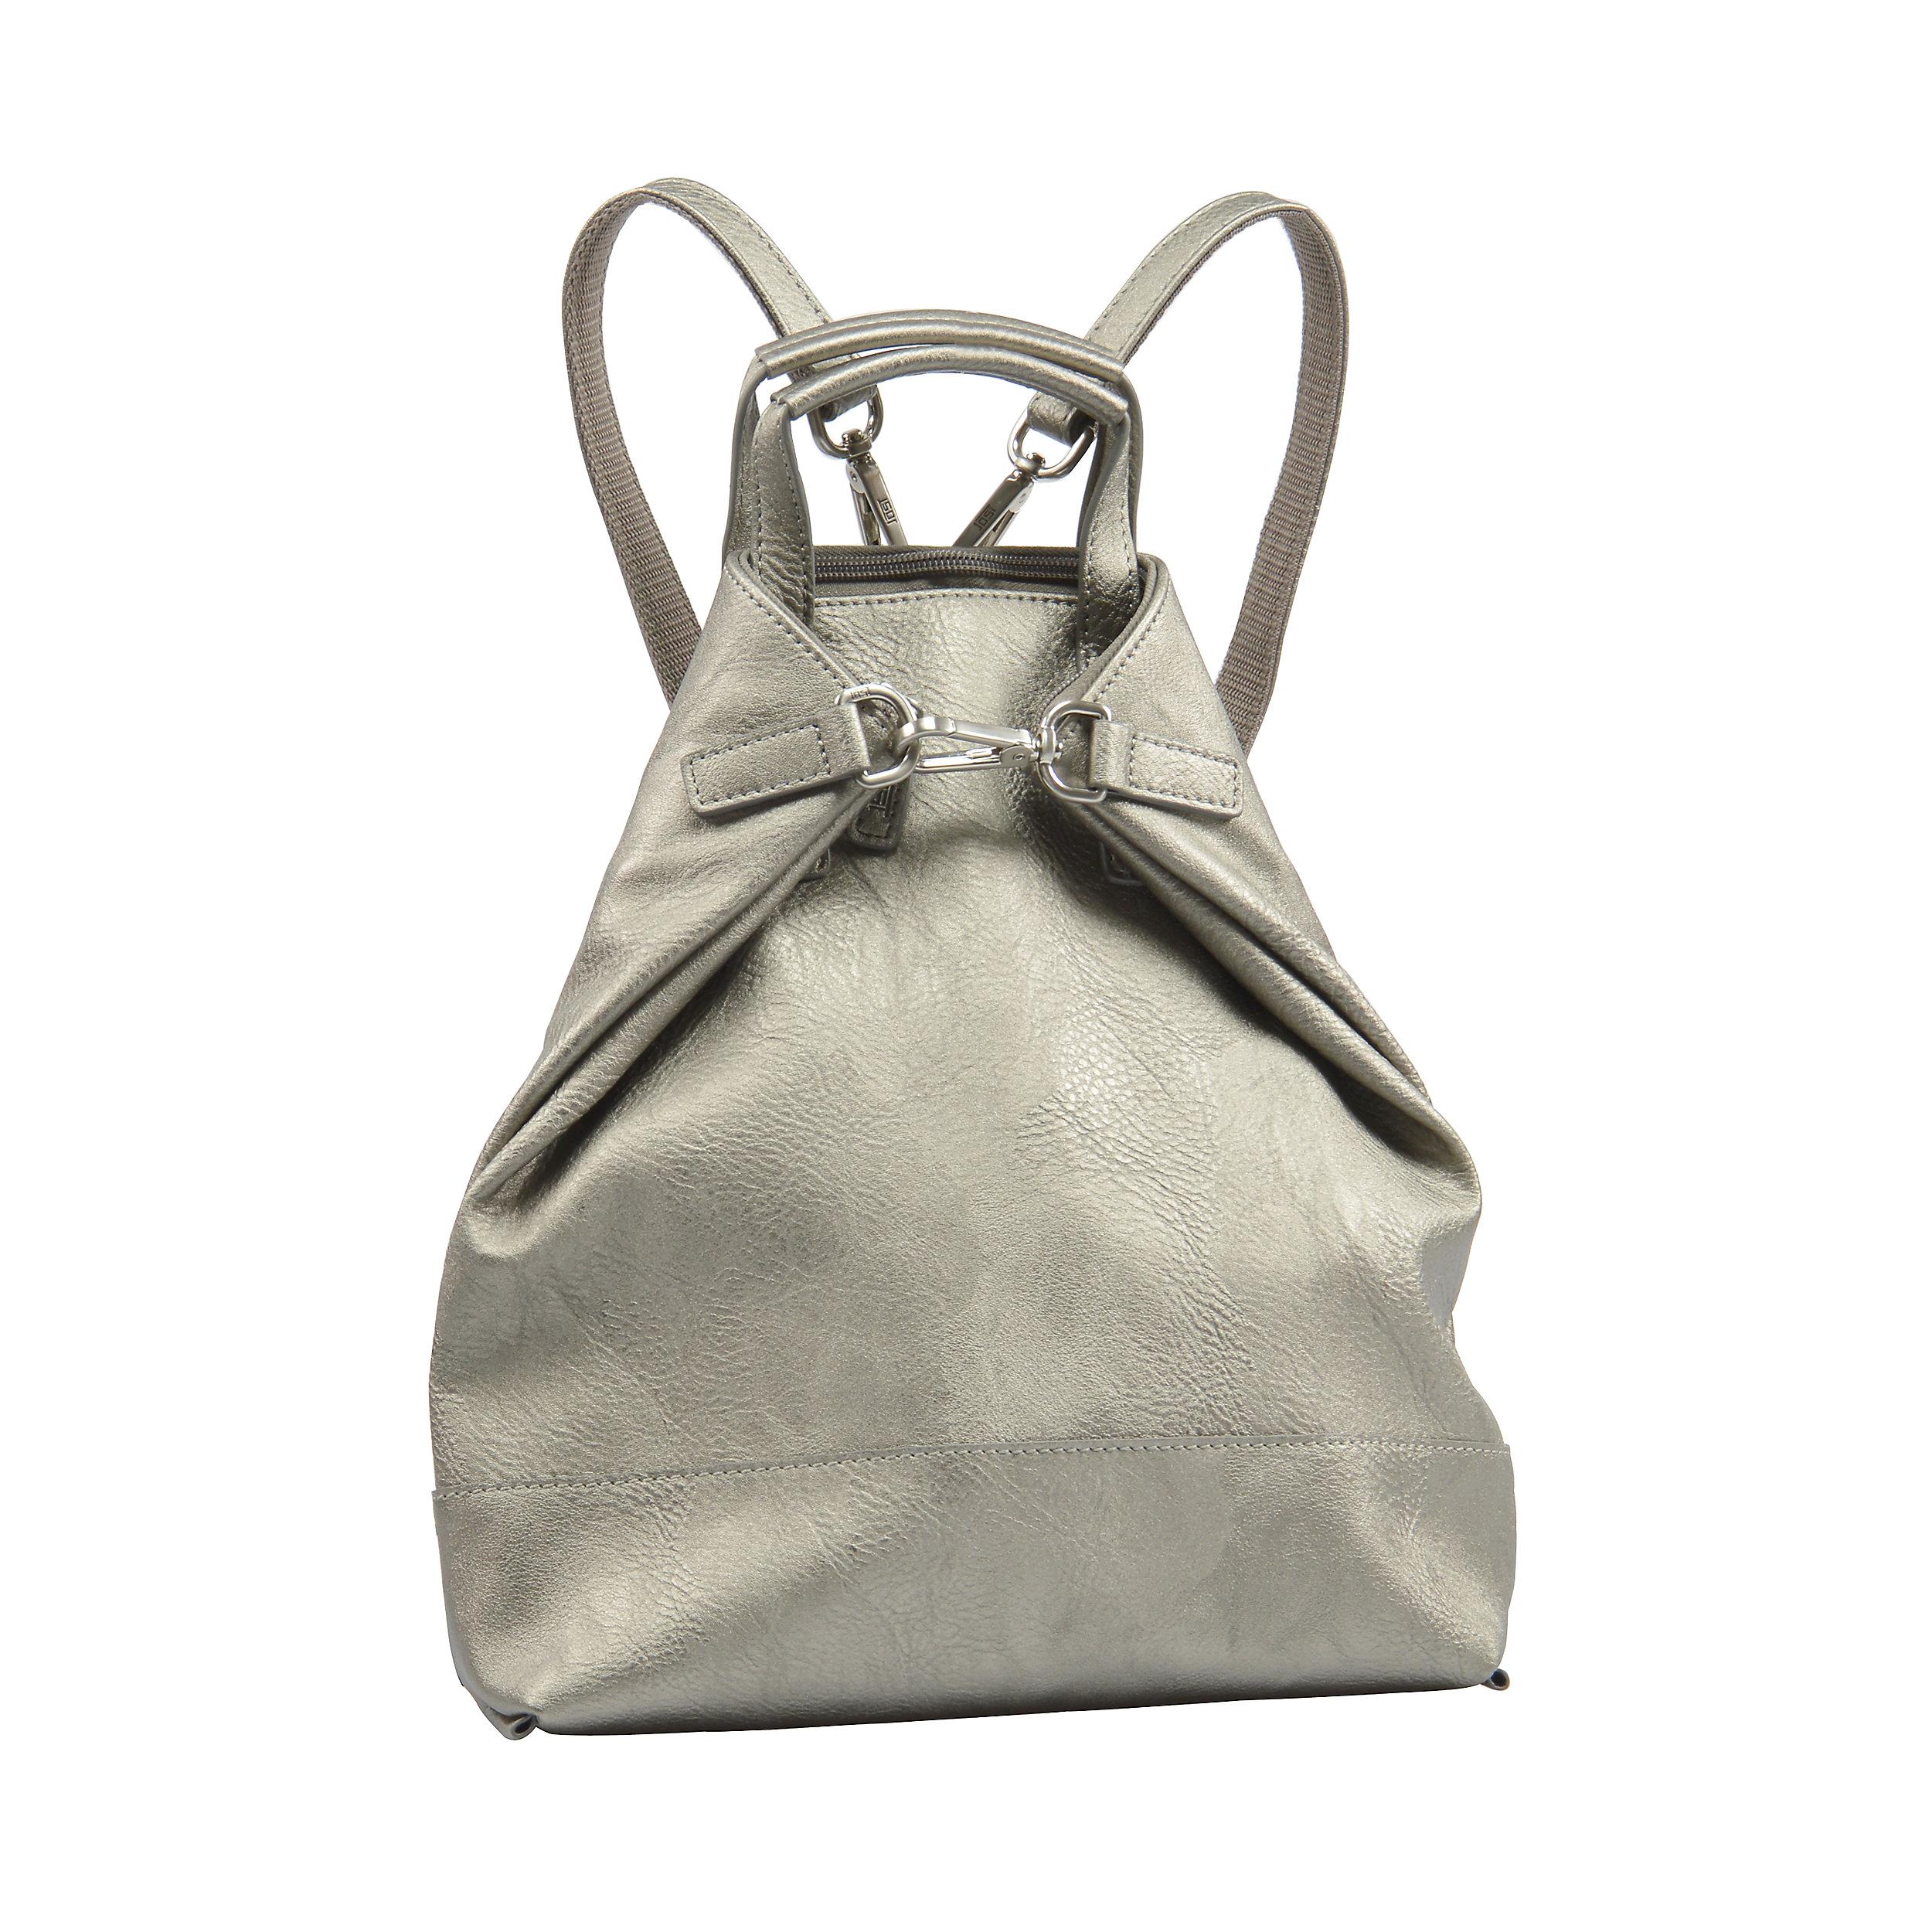 Rucksack XChange Bag 3in1 13 Zoll XS Merritt 5 Liter